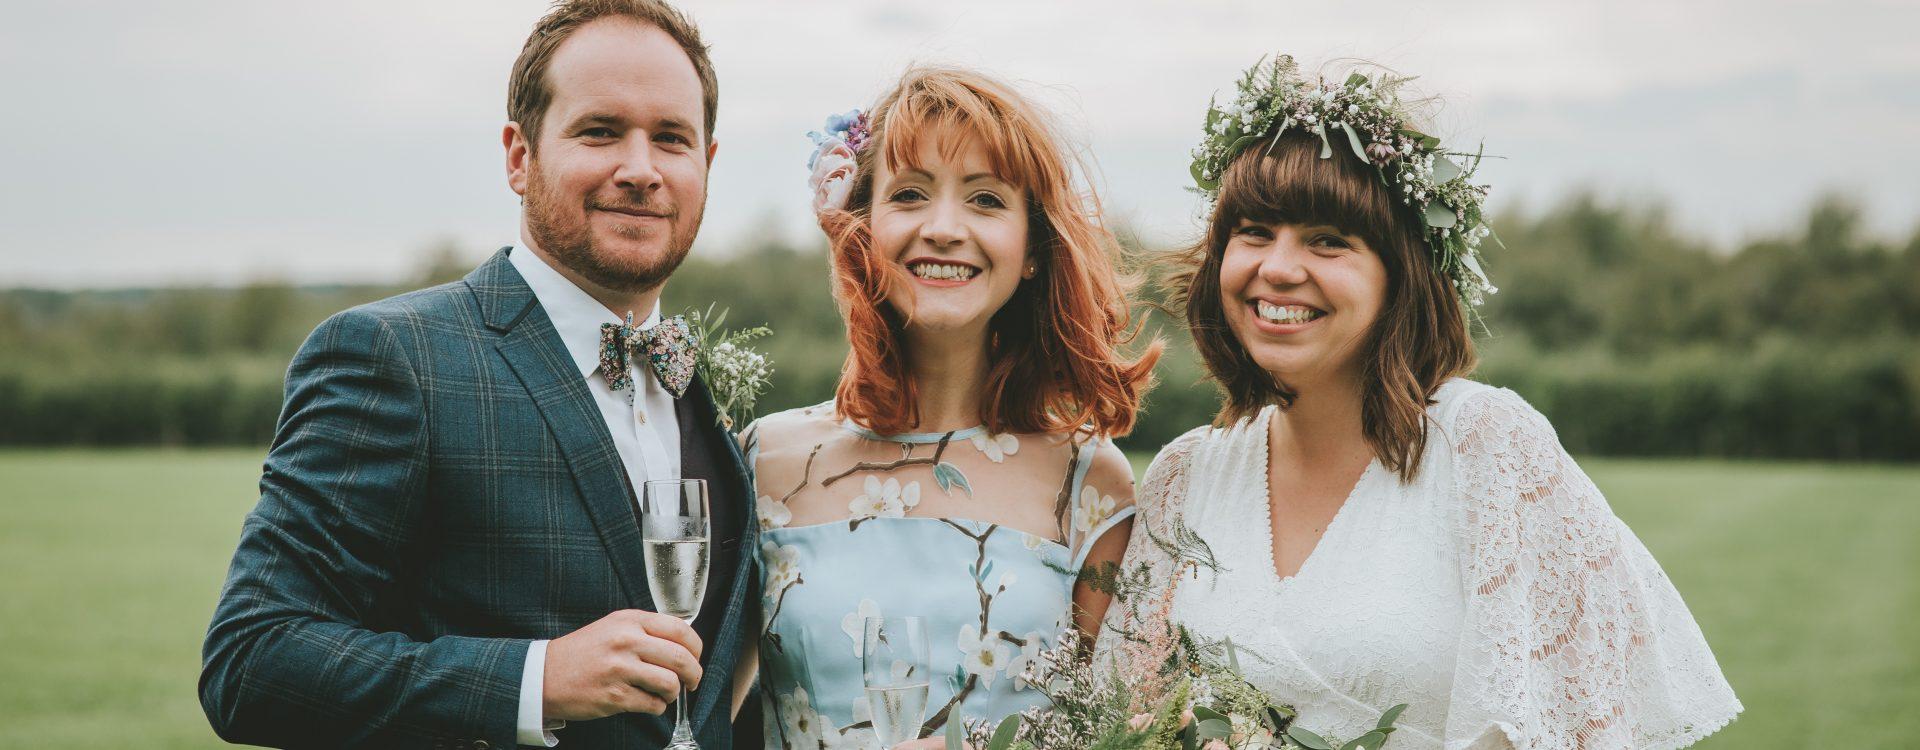 2017 06 registry office wedding vows examples - Samantha Kelsie Uk Celebrant